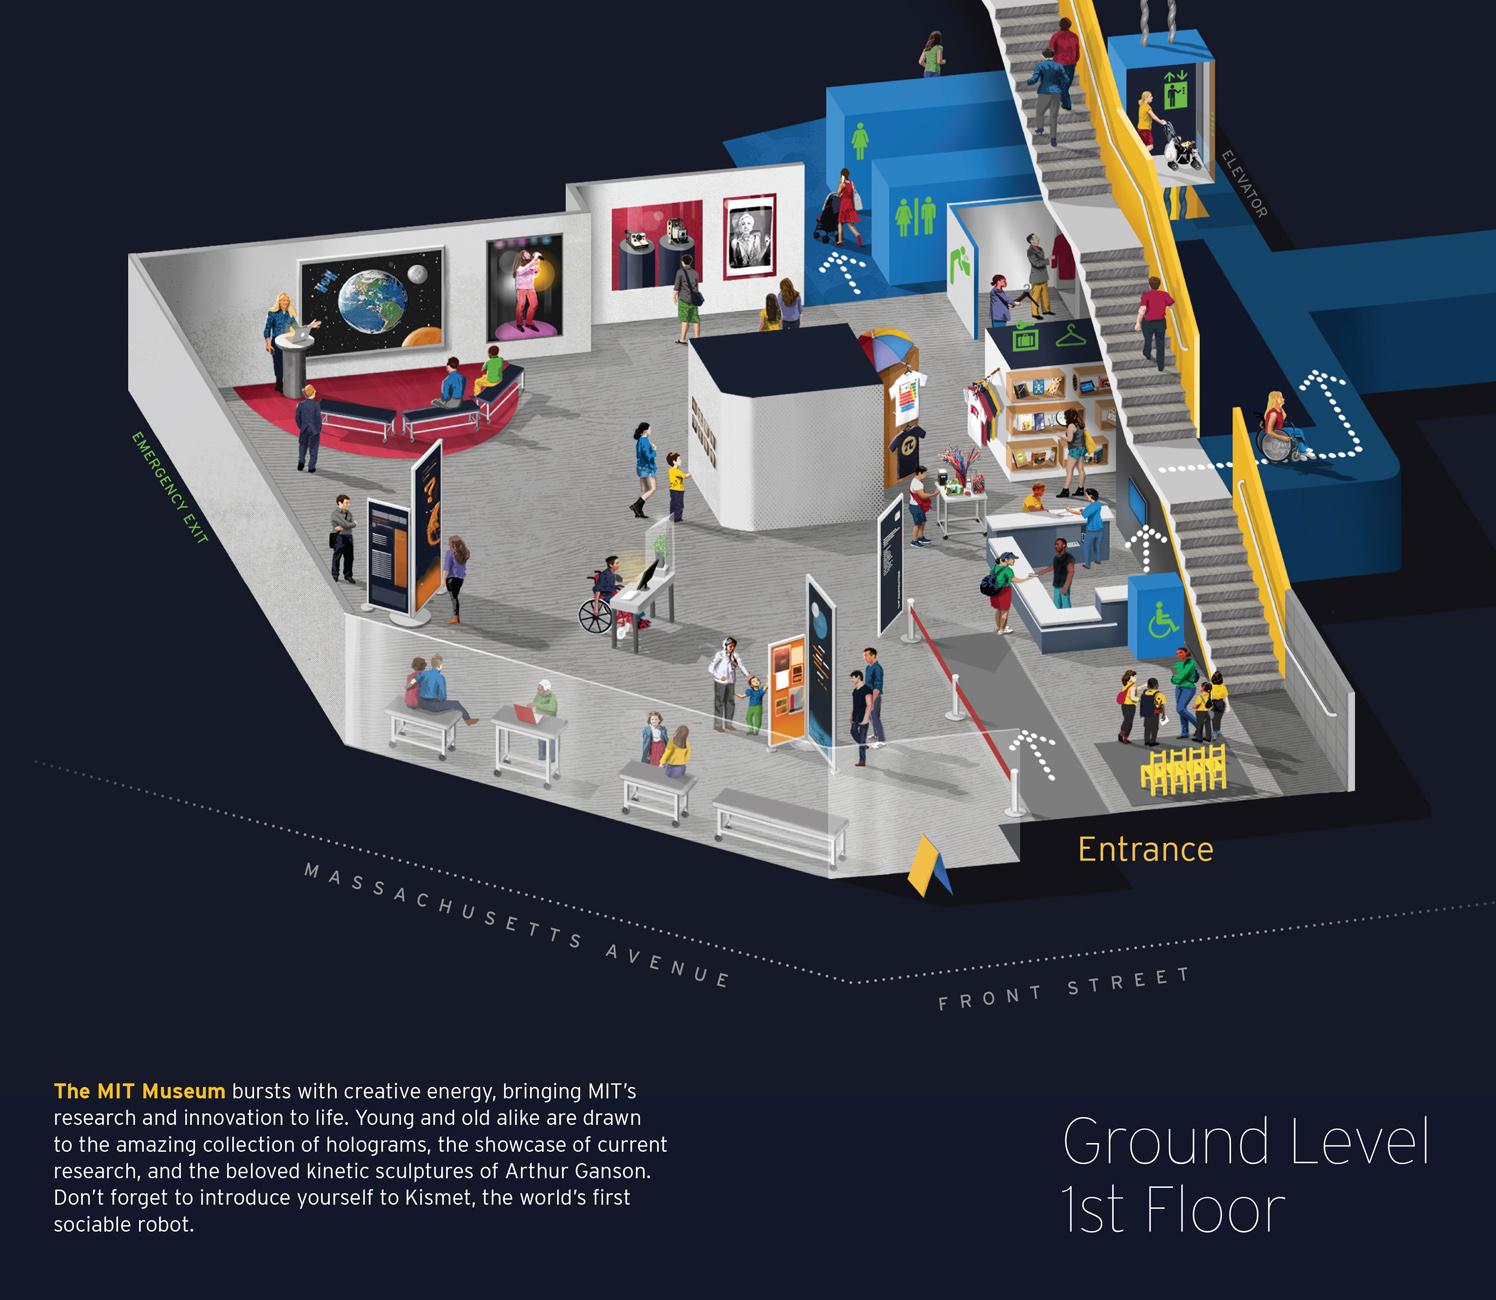 1st Floor / MIT Museum Map